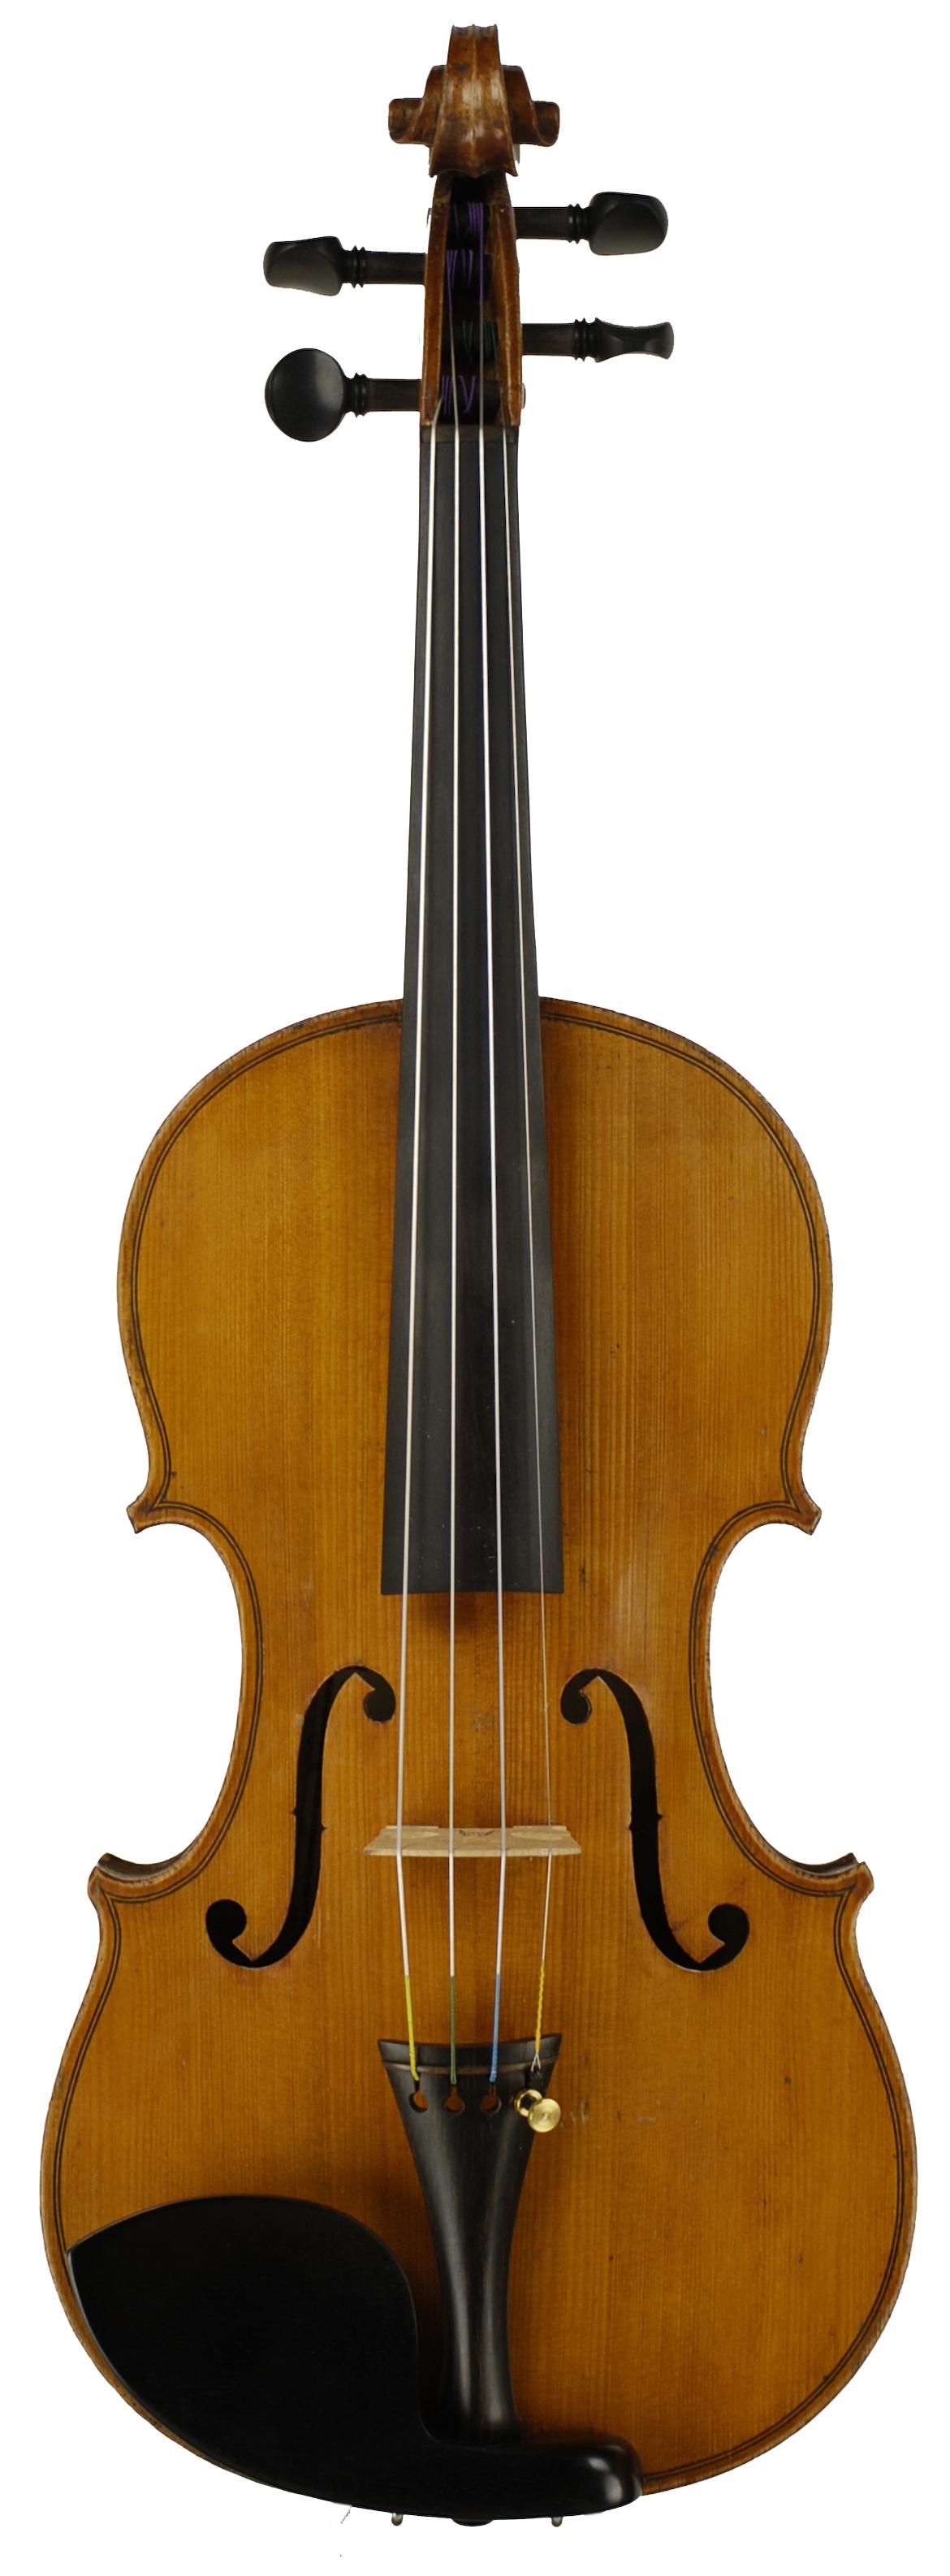 Mirecourt France  city images : Lyon & Healy, Mirecourt, France 1916 | J.R. Judd Violins